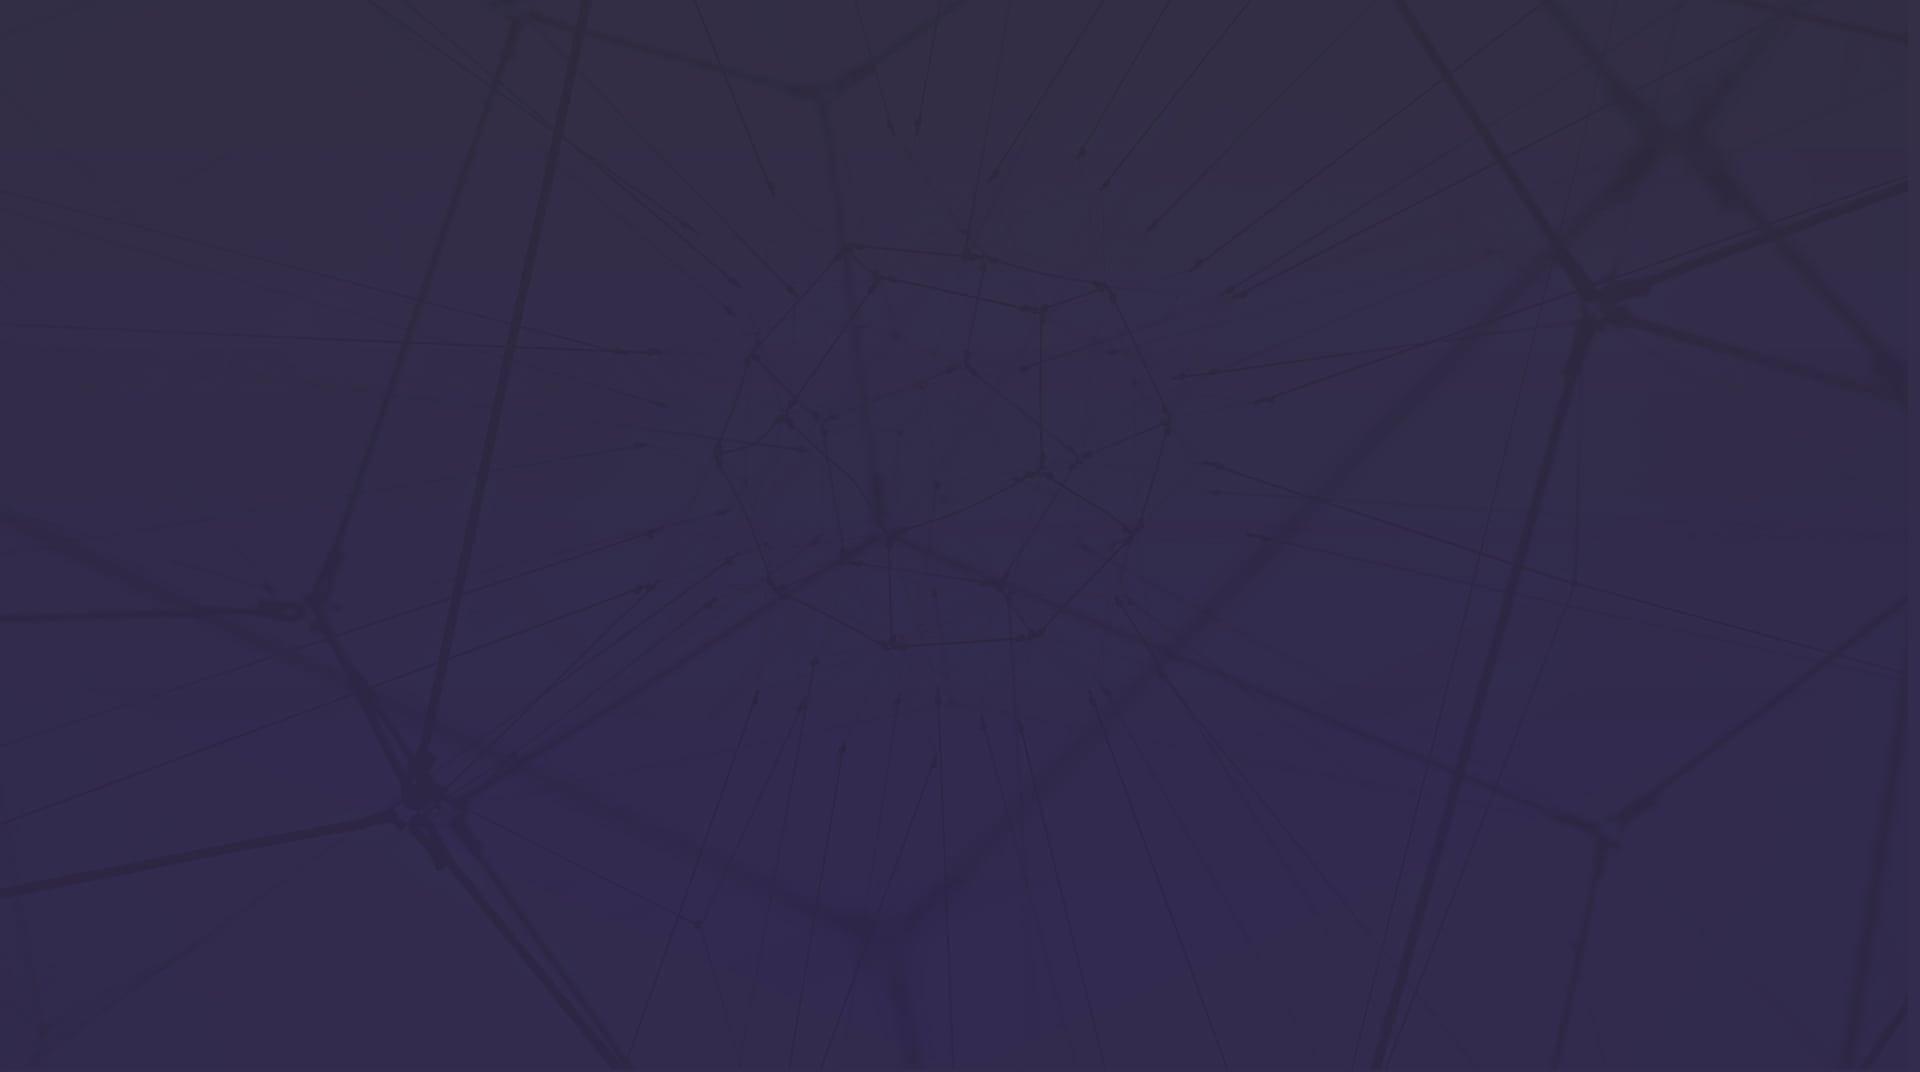 iotbox_objets_connectes